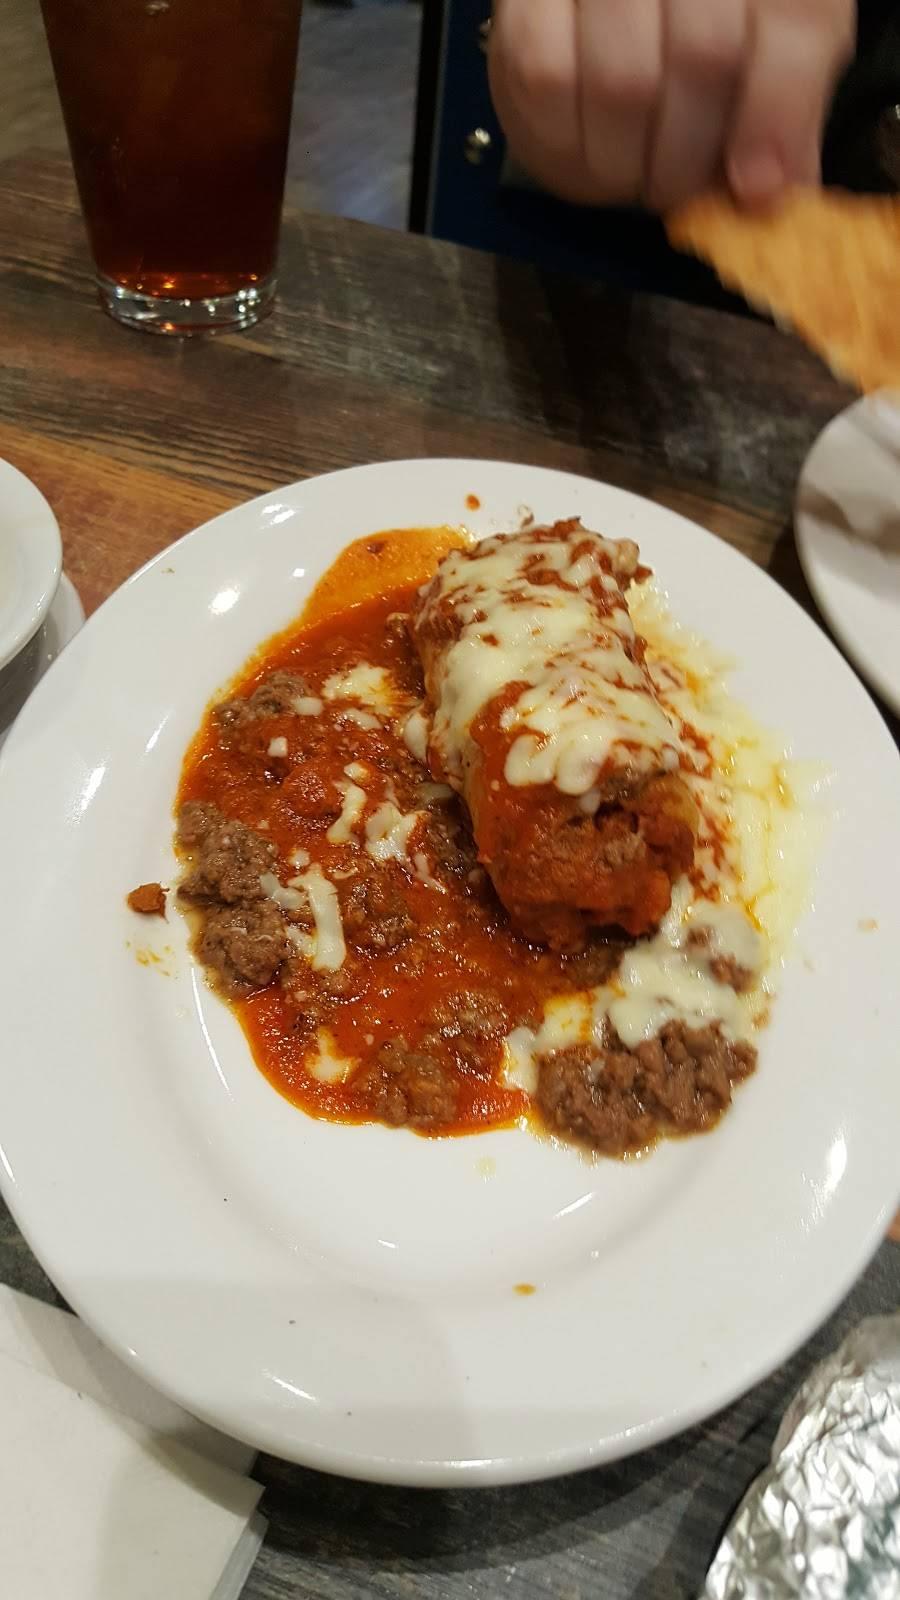 Tequila's Mexican Restaurant #2 Bellevue | restaurant | 7628 Hwy 70 S, Nashville, TN 37221, USA | 6159426064 OR +1 615-942-6064